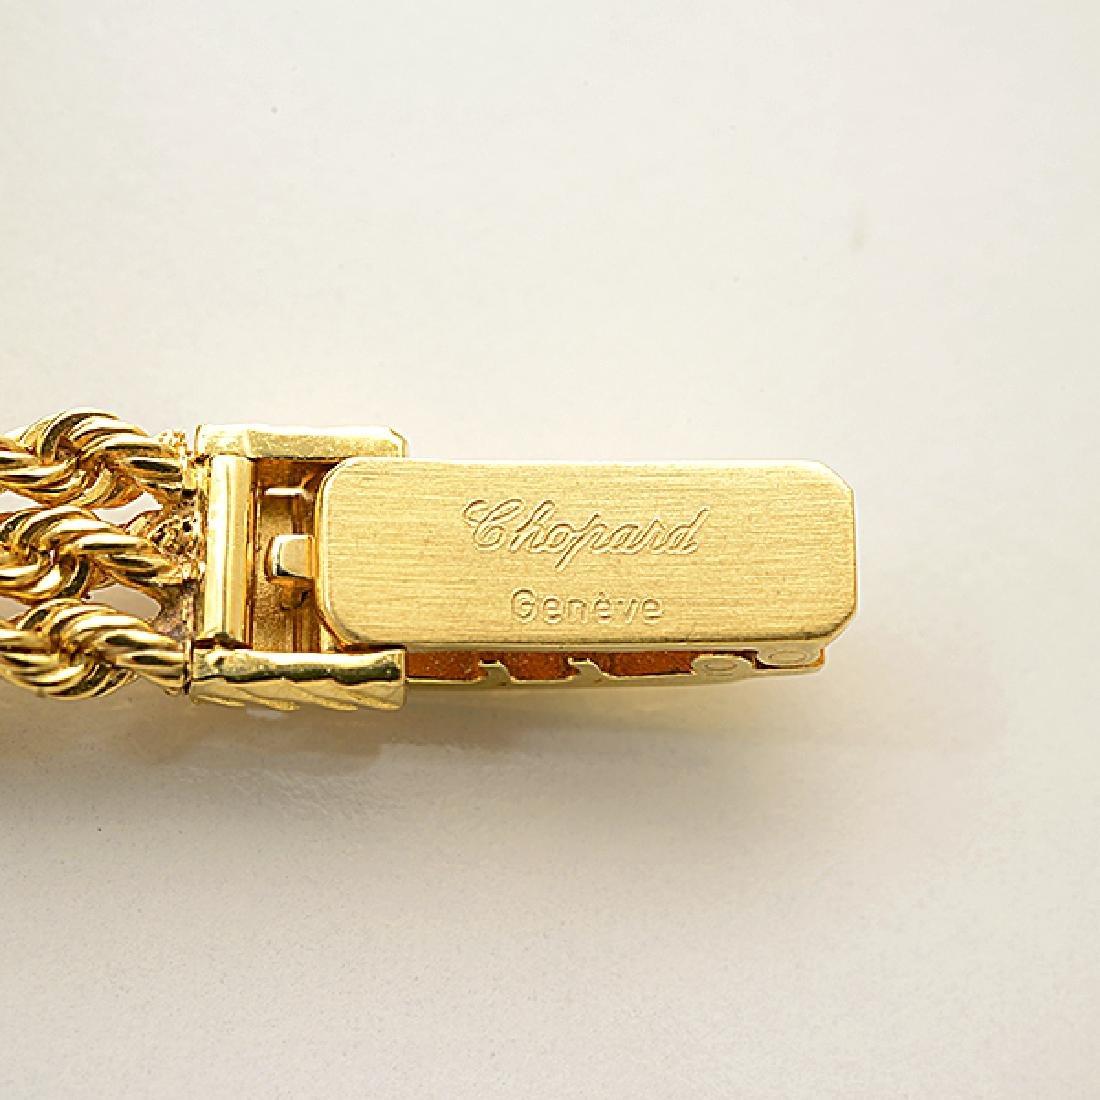 Ladies Chopard 18k Yellow Gold Wristwatch. - 5